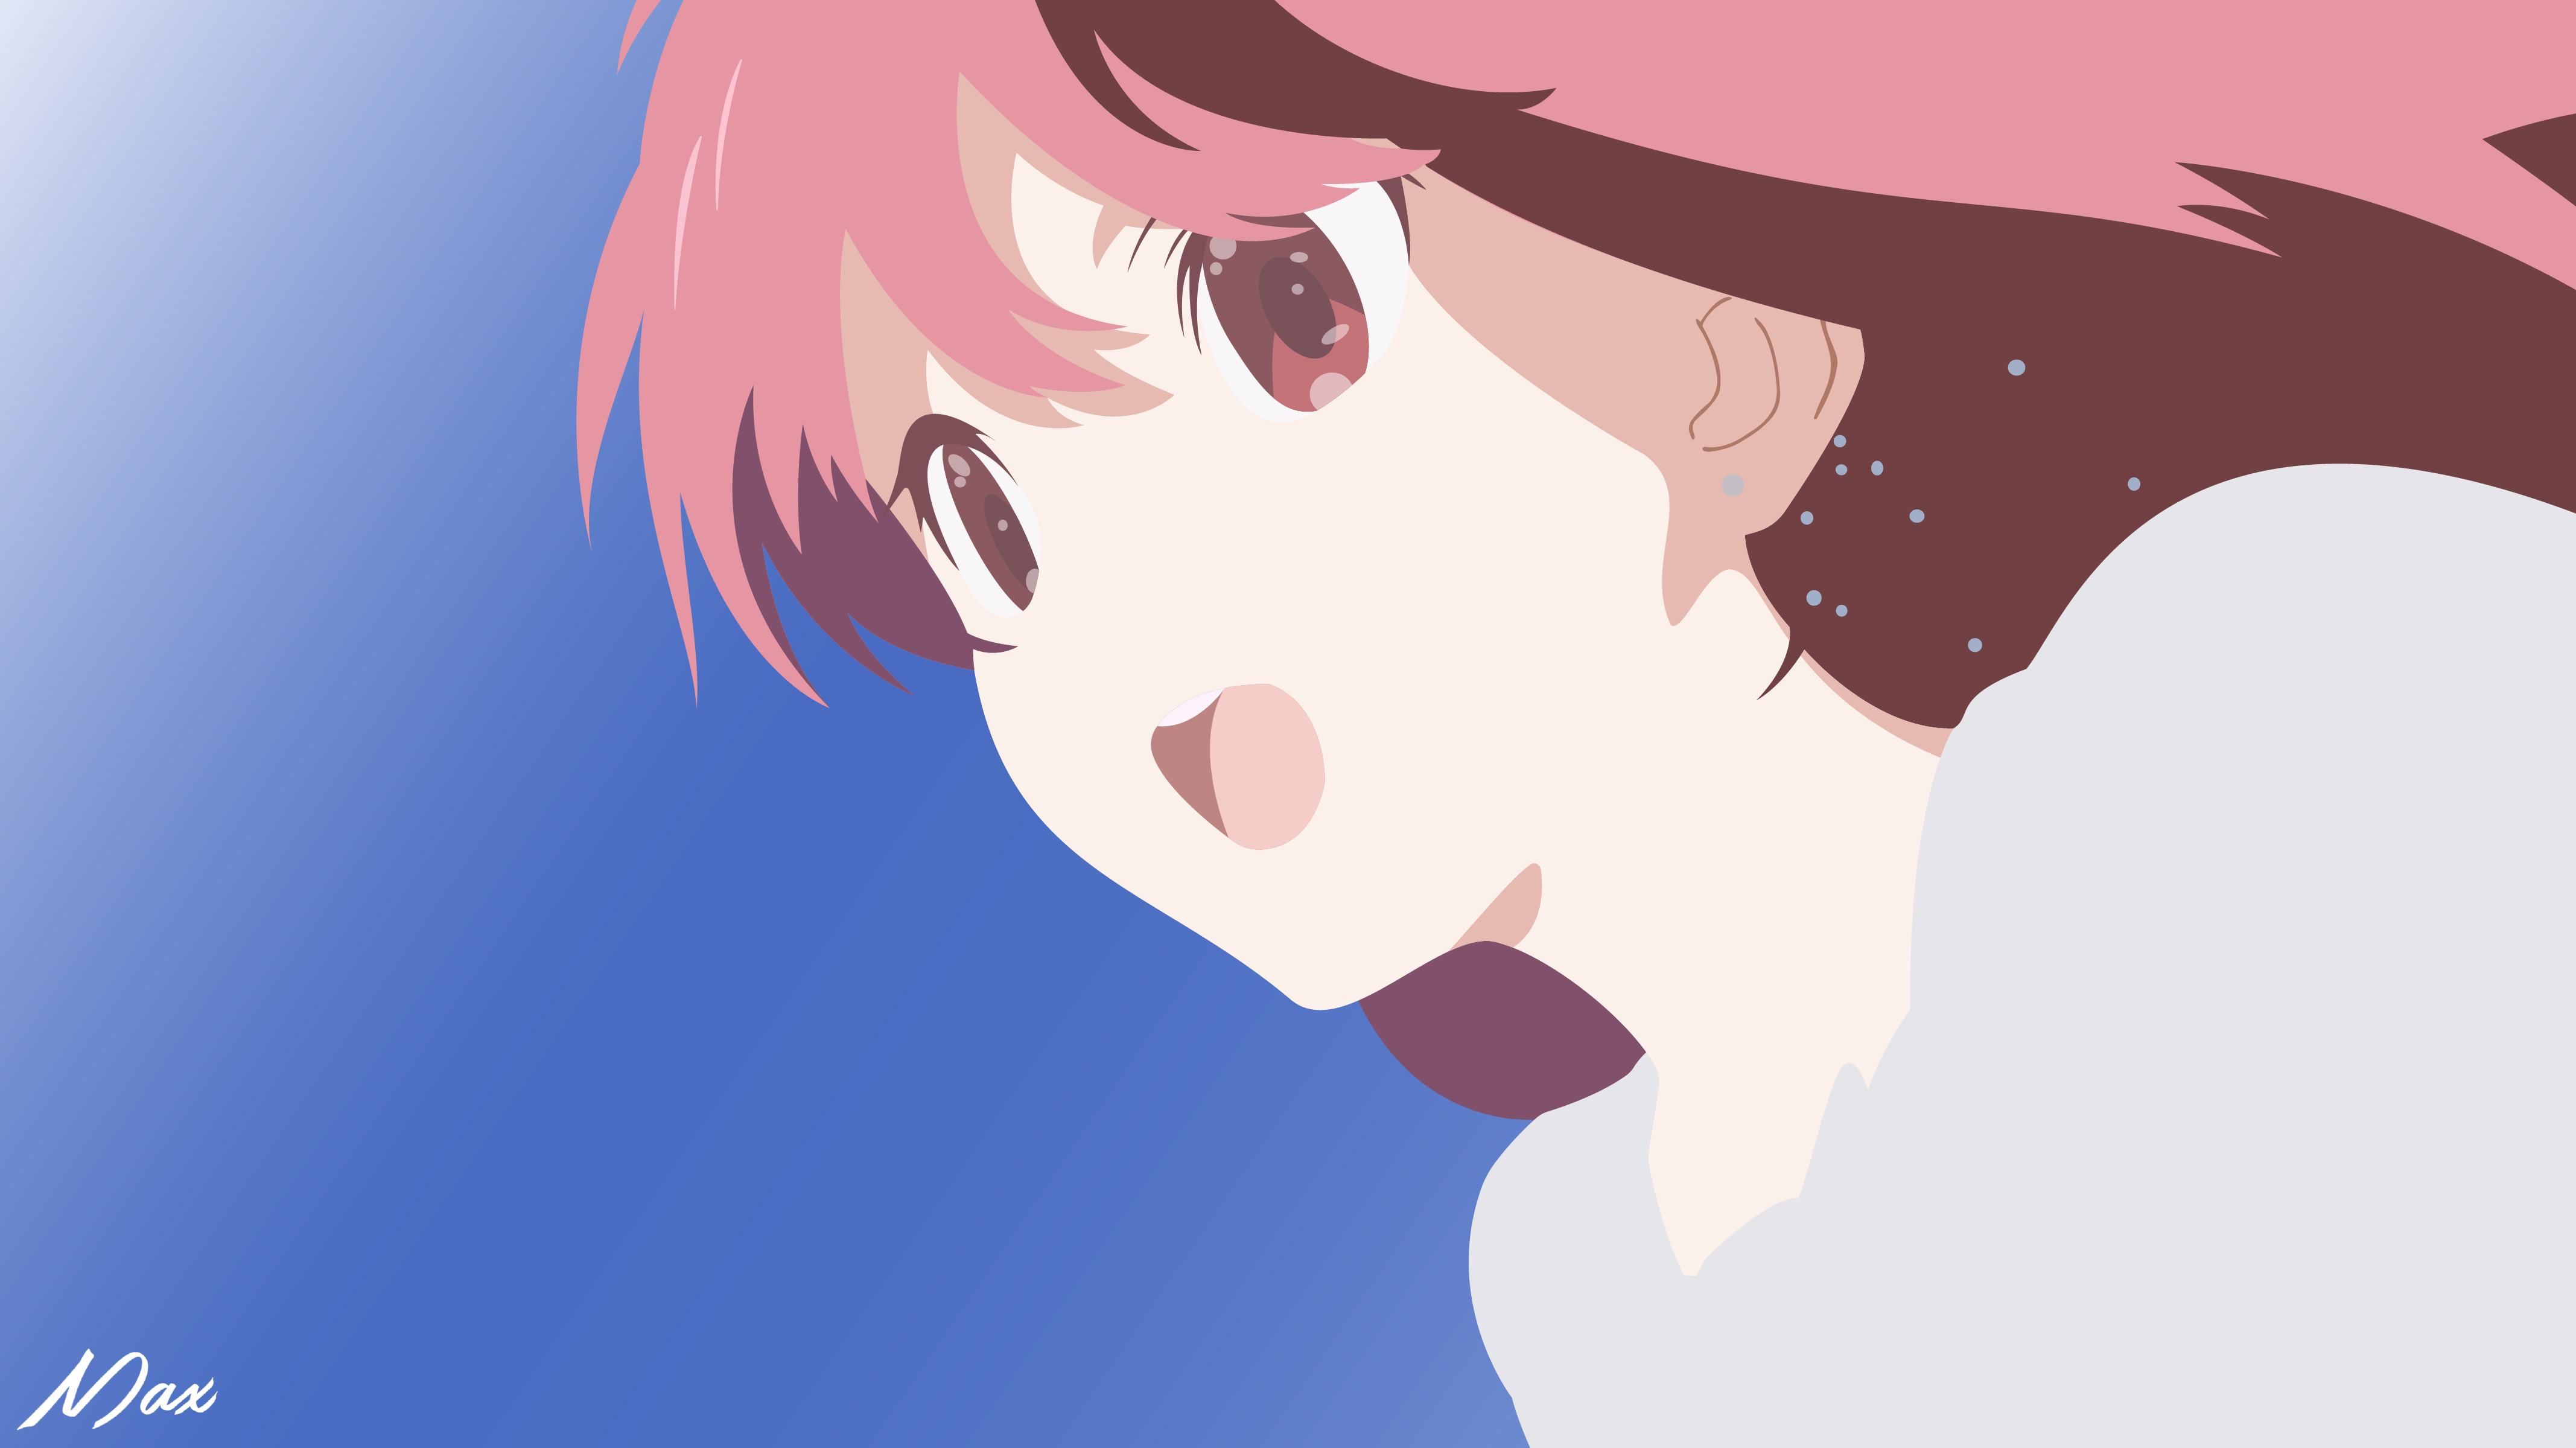 Rin shelter minimal wallpaper by max028 on deviantart for Minimal art youtube